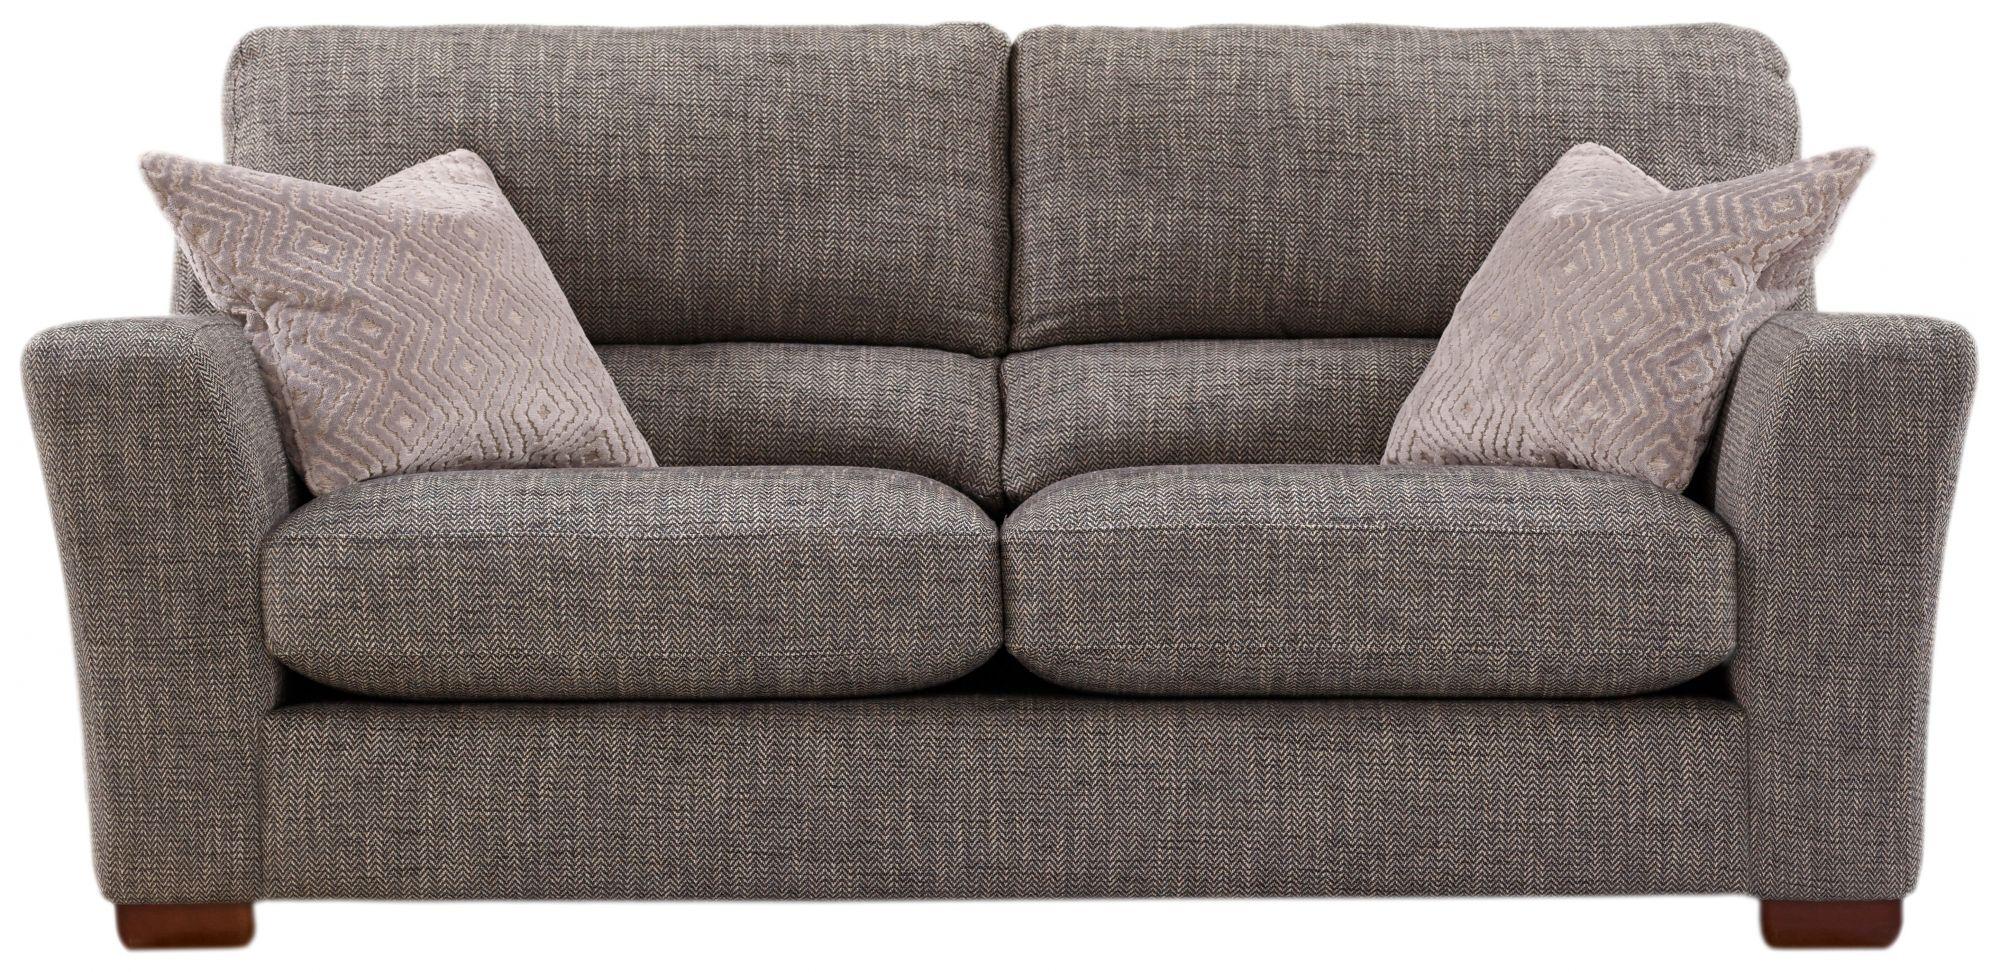 Ashwood Designs Ashwood Plaza 3 Seater Sofa Medium Sofas